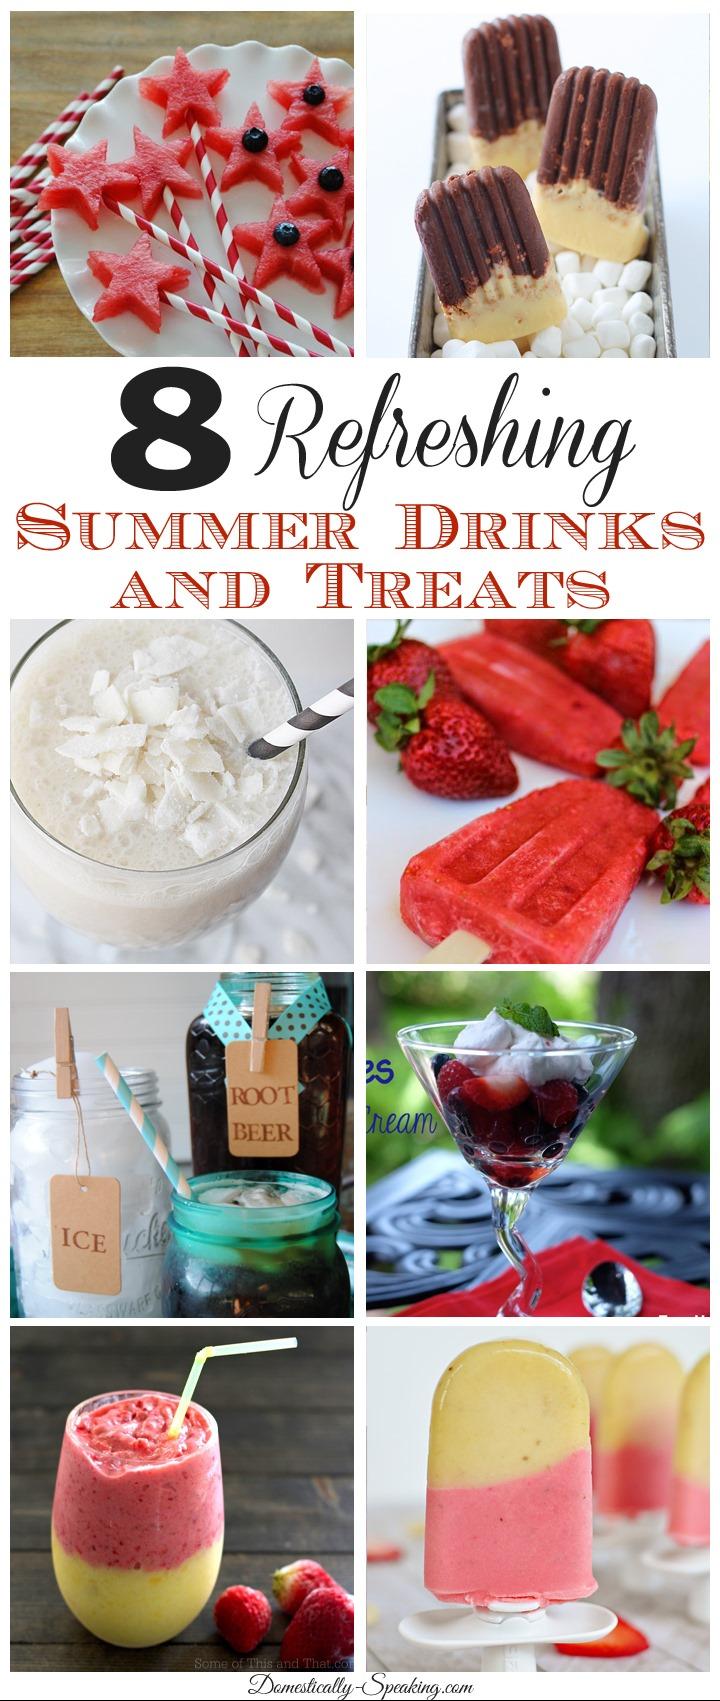 8-Refreshing-Summer-Drinks-and-Treats_thumb